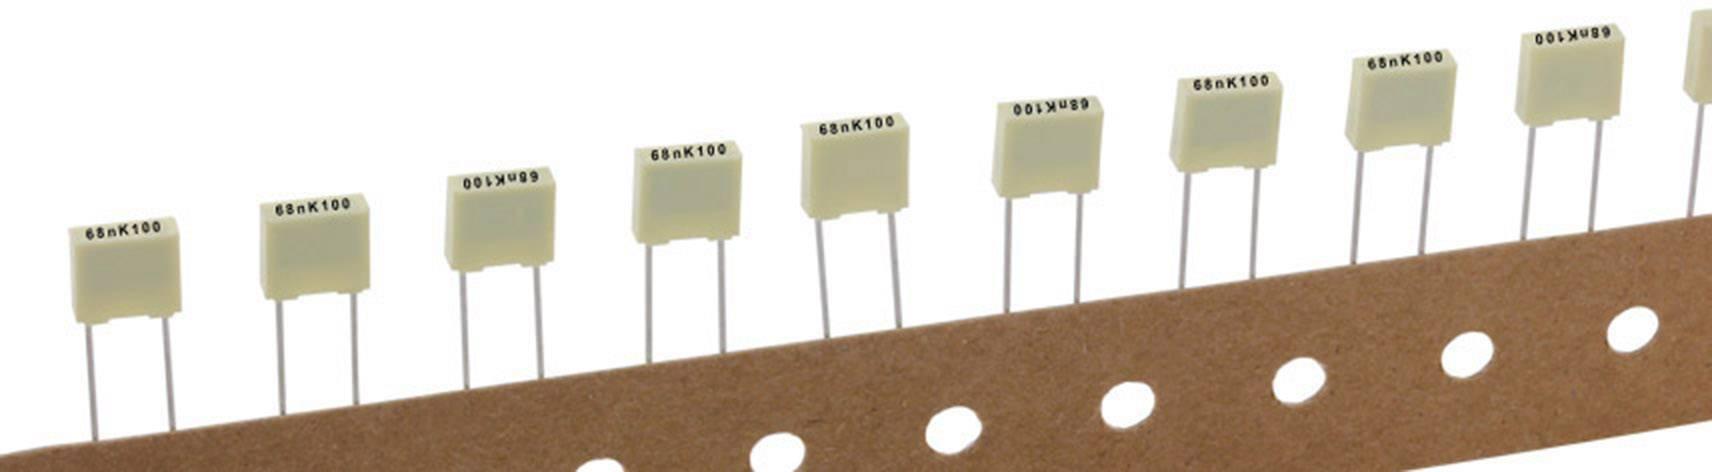 Polyesterový kondenzátor Kemet R82EC2470DQ60K+ radiálne vývody, 47 nF, 100 V,10 %, 5 mm, (d x š x v) 7.2 x 2.5 mm x 6.5 mm, 1 ks